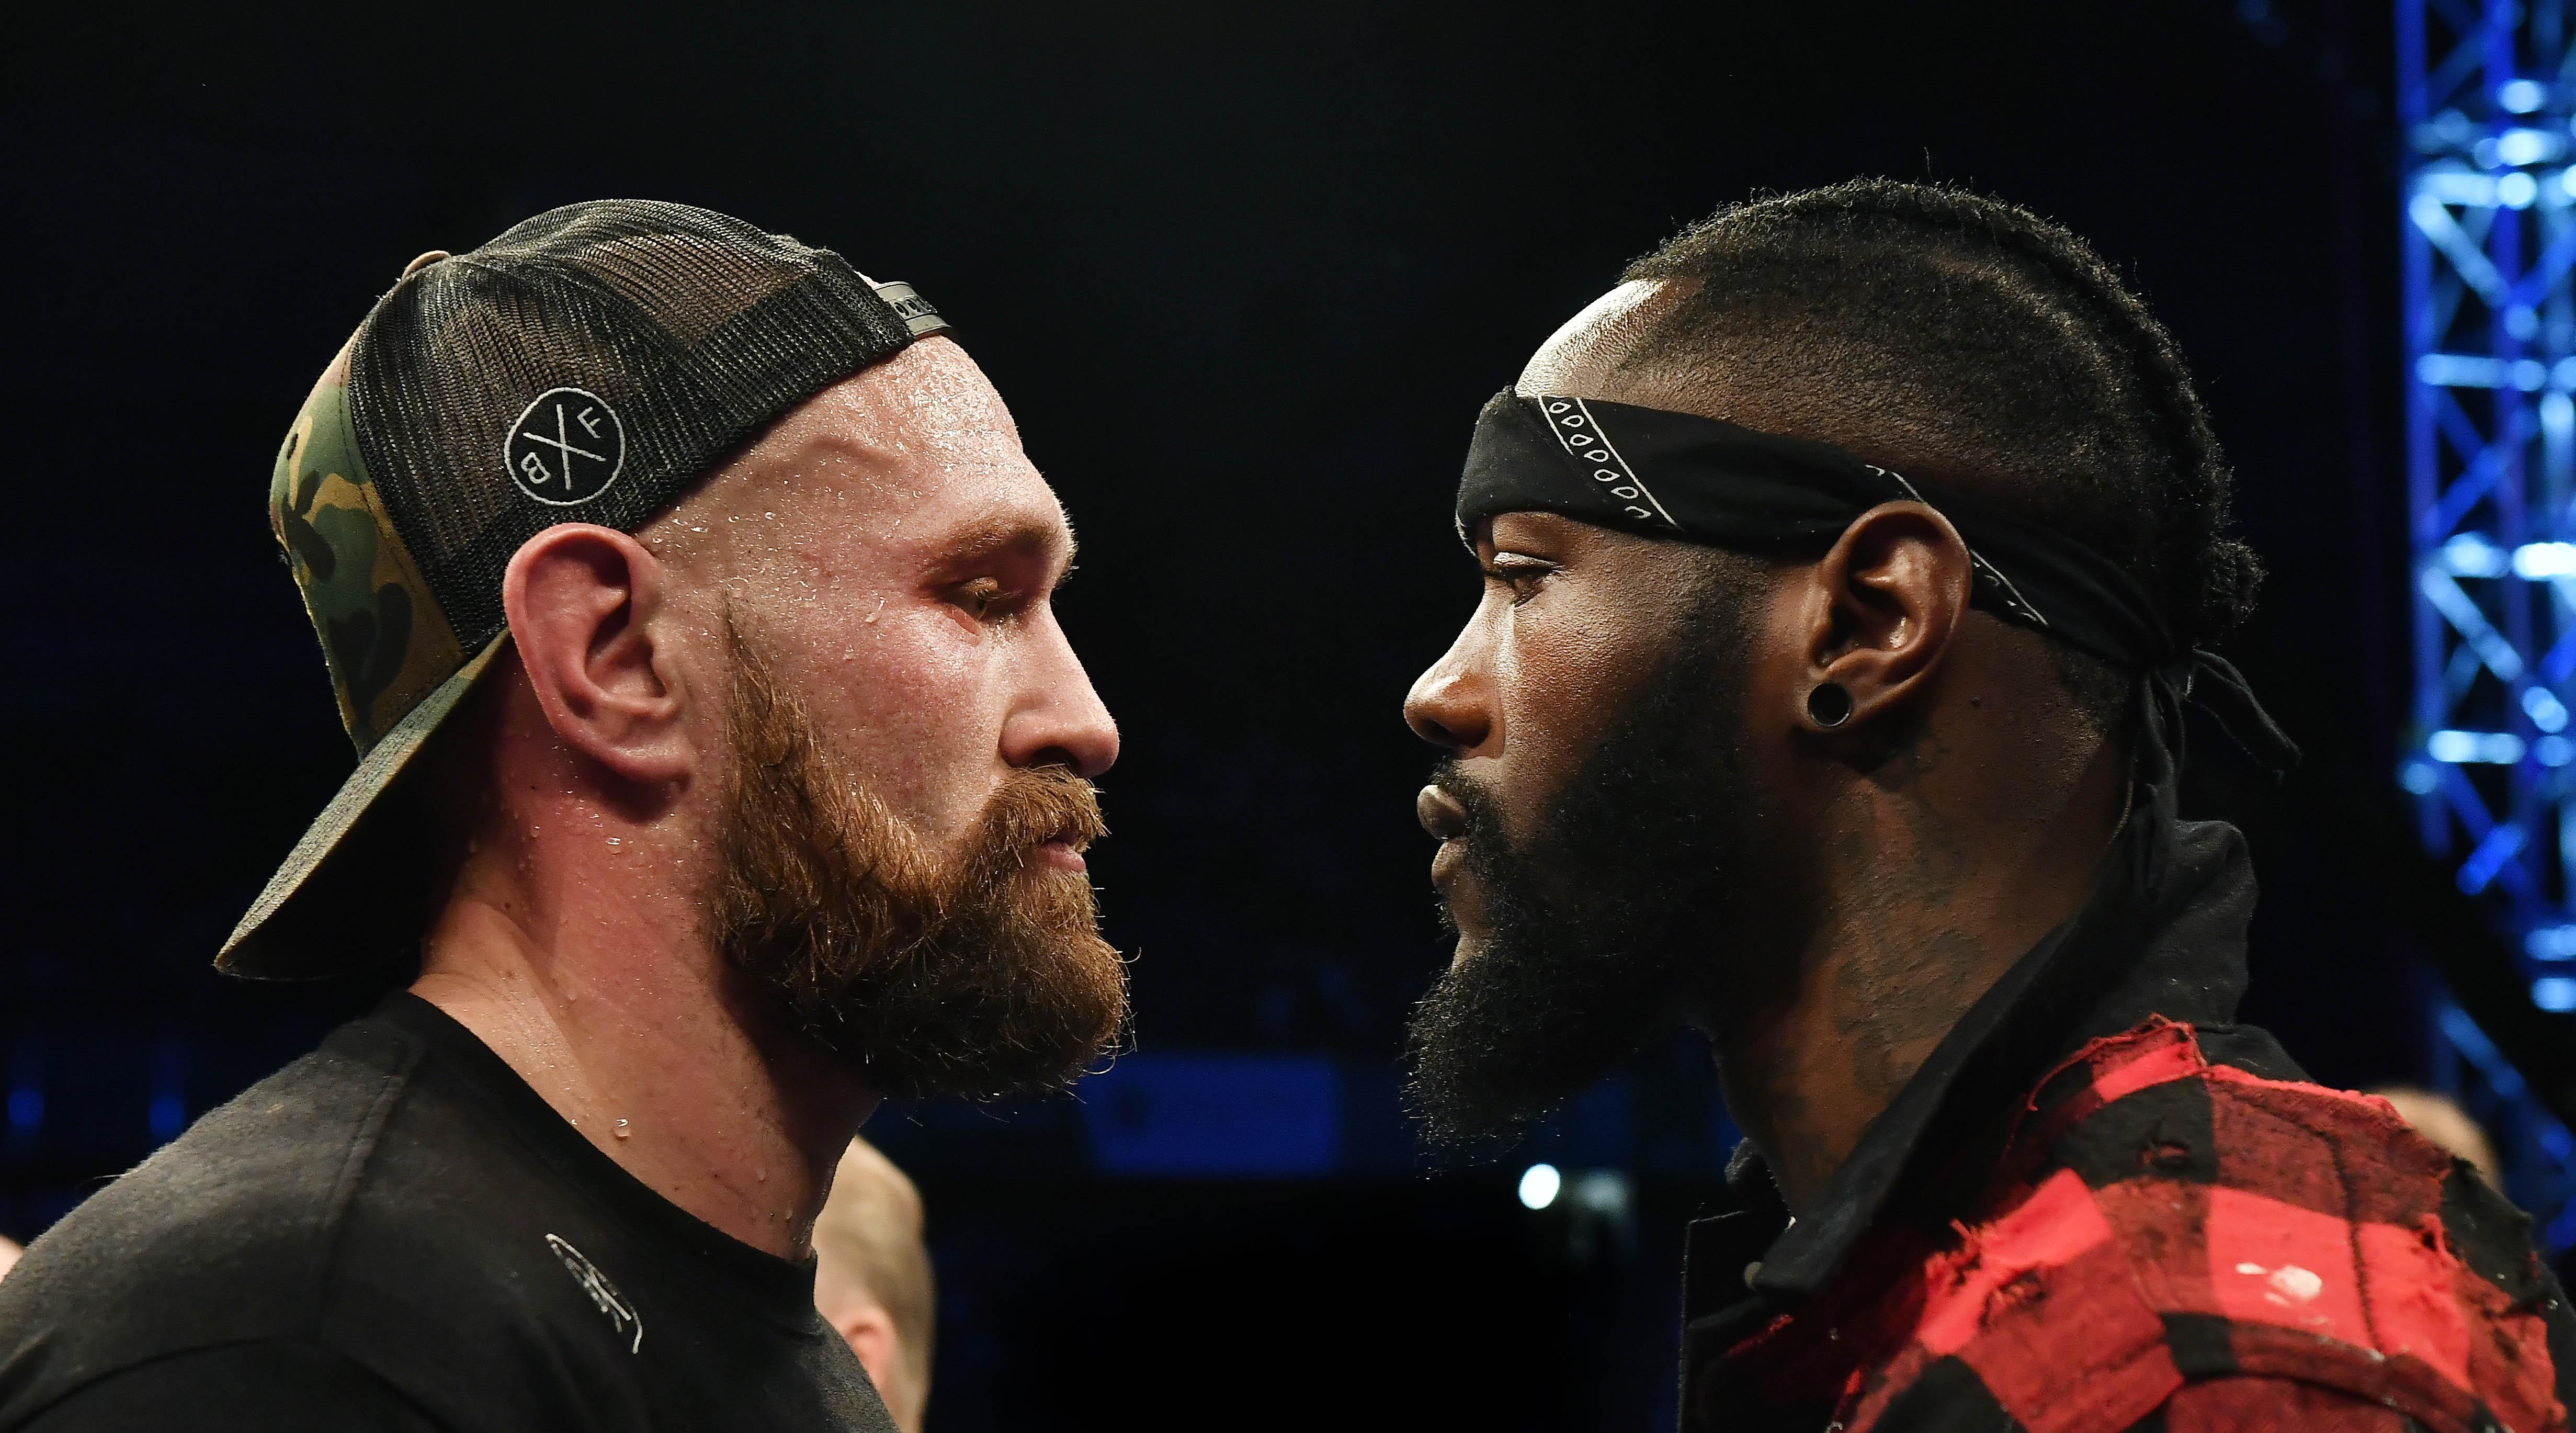 Tyson Fury will fight Deontay Wilder on December 1